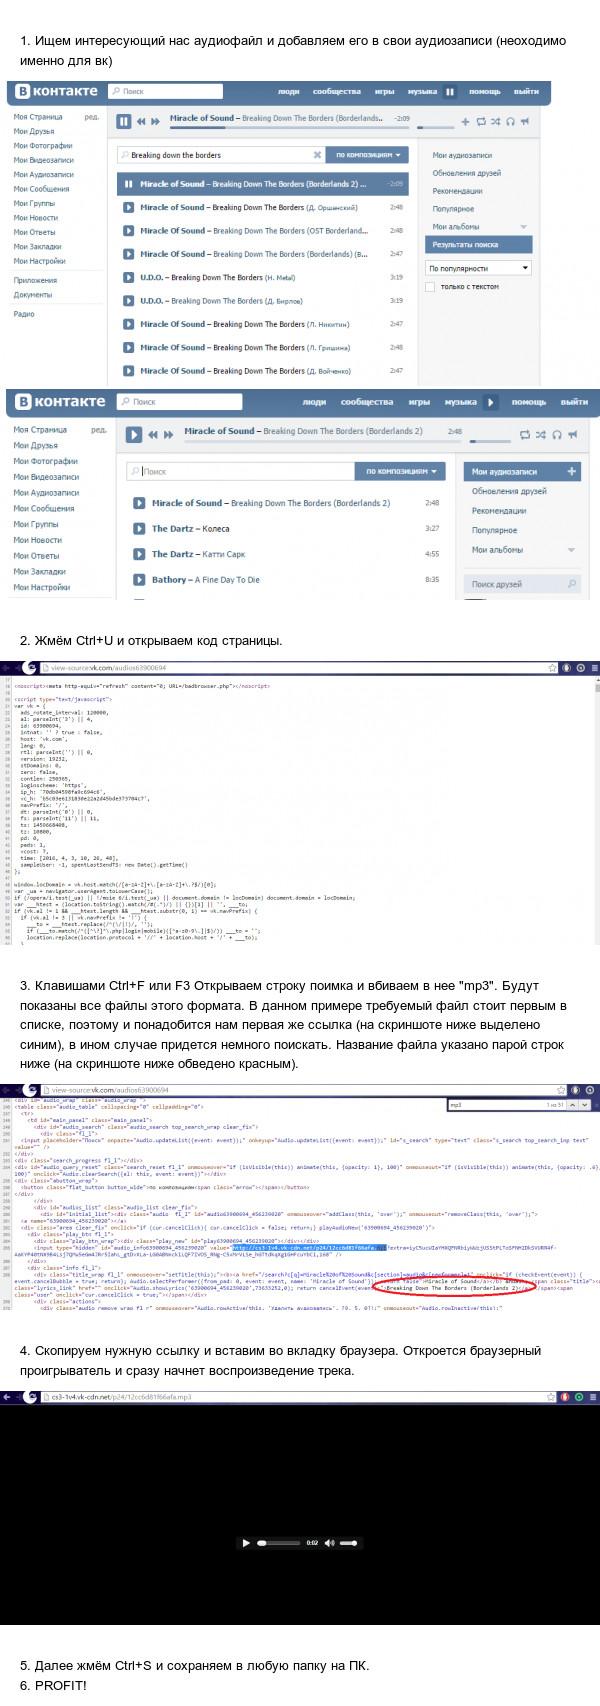 Качаем аудиофайлы из браузера Длиннопост, Аудиофайлы, Музыка, ВКонтакте, Google Chrome